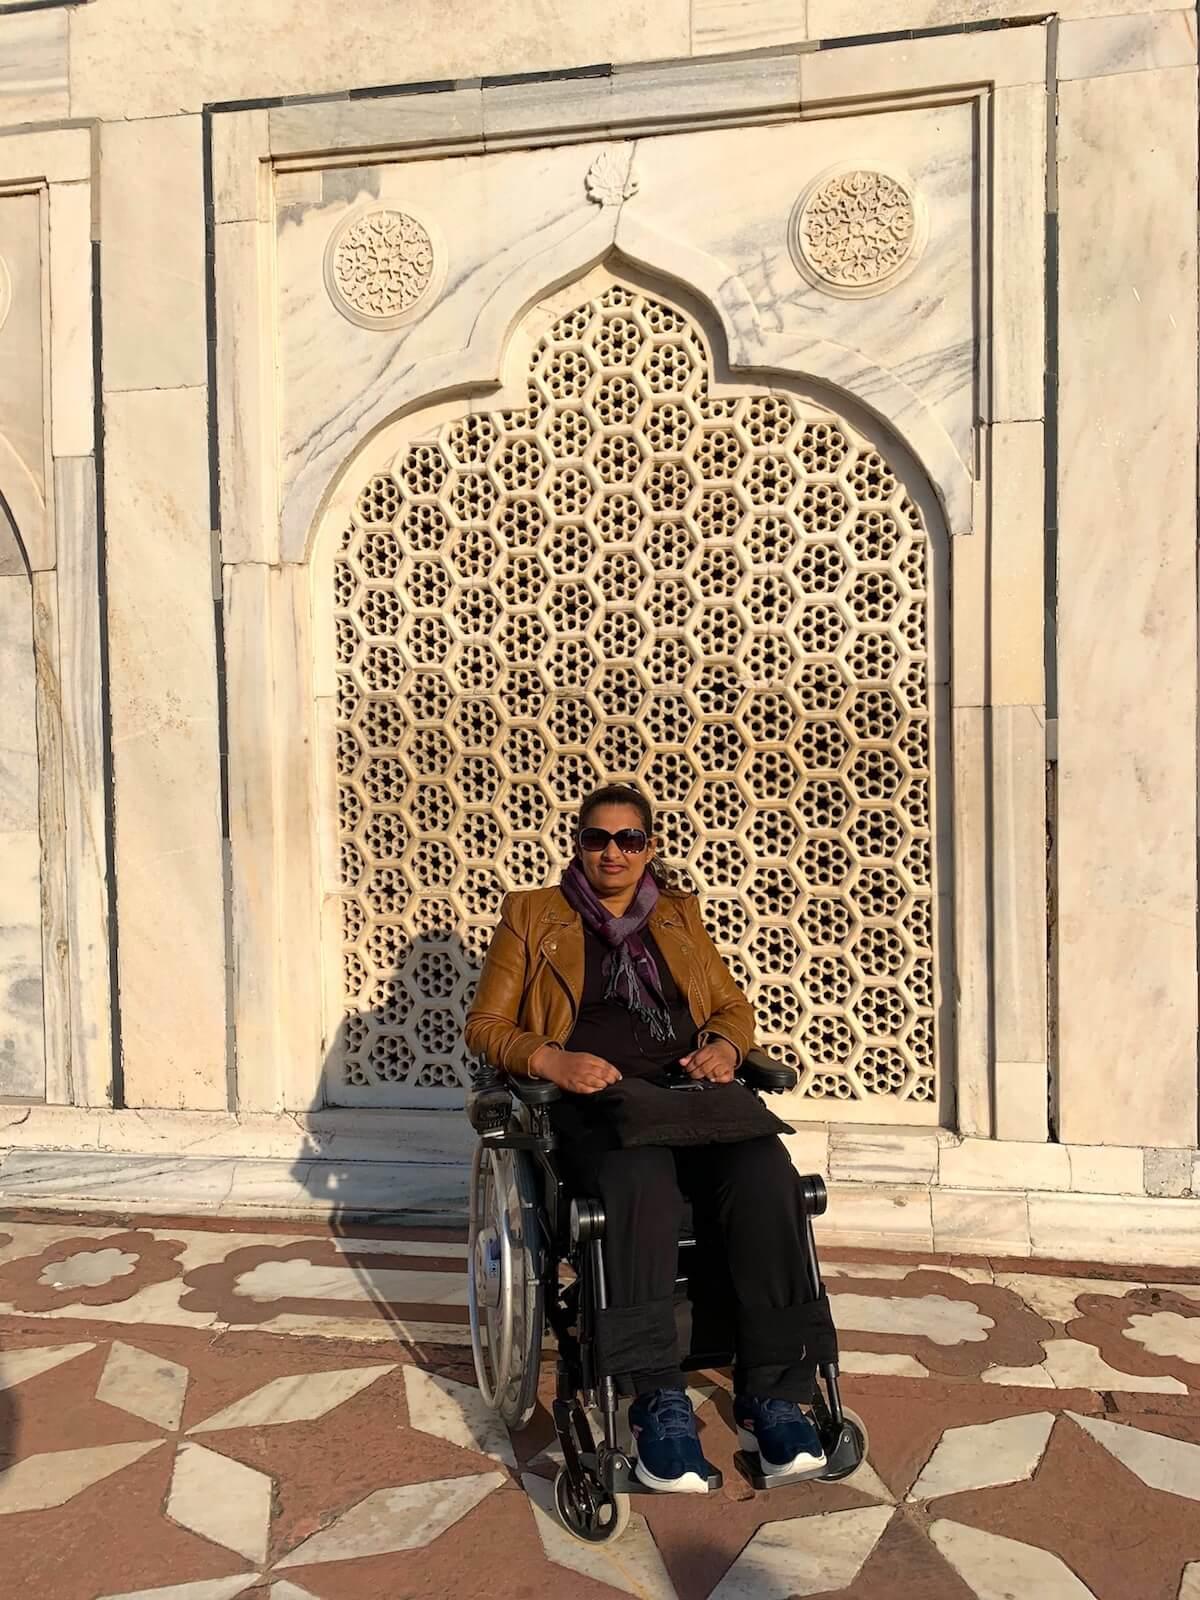 Jali-work on Taj Mahal windows provided ventilation